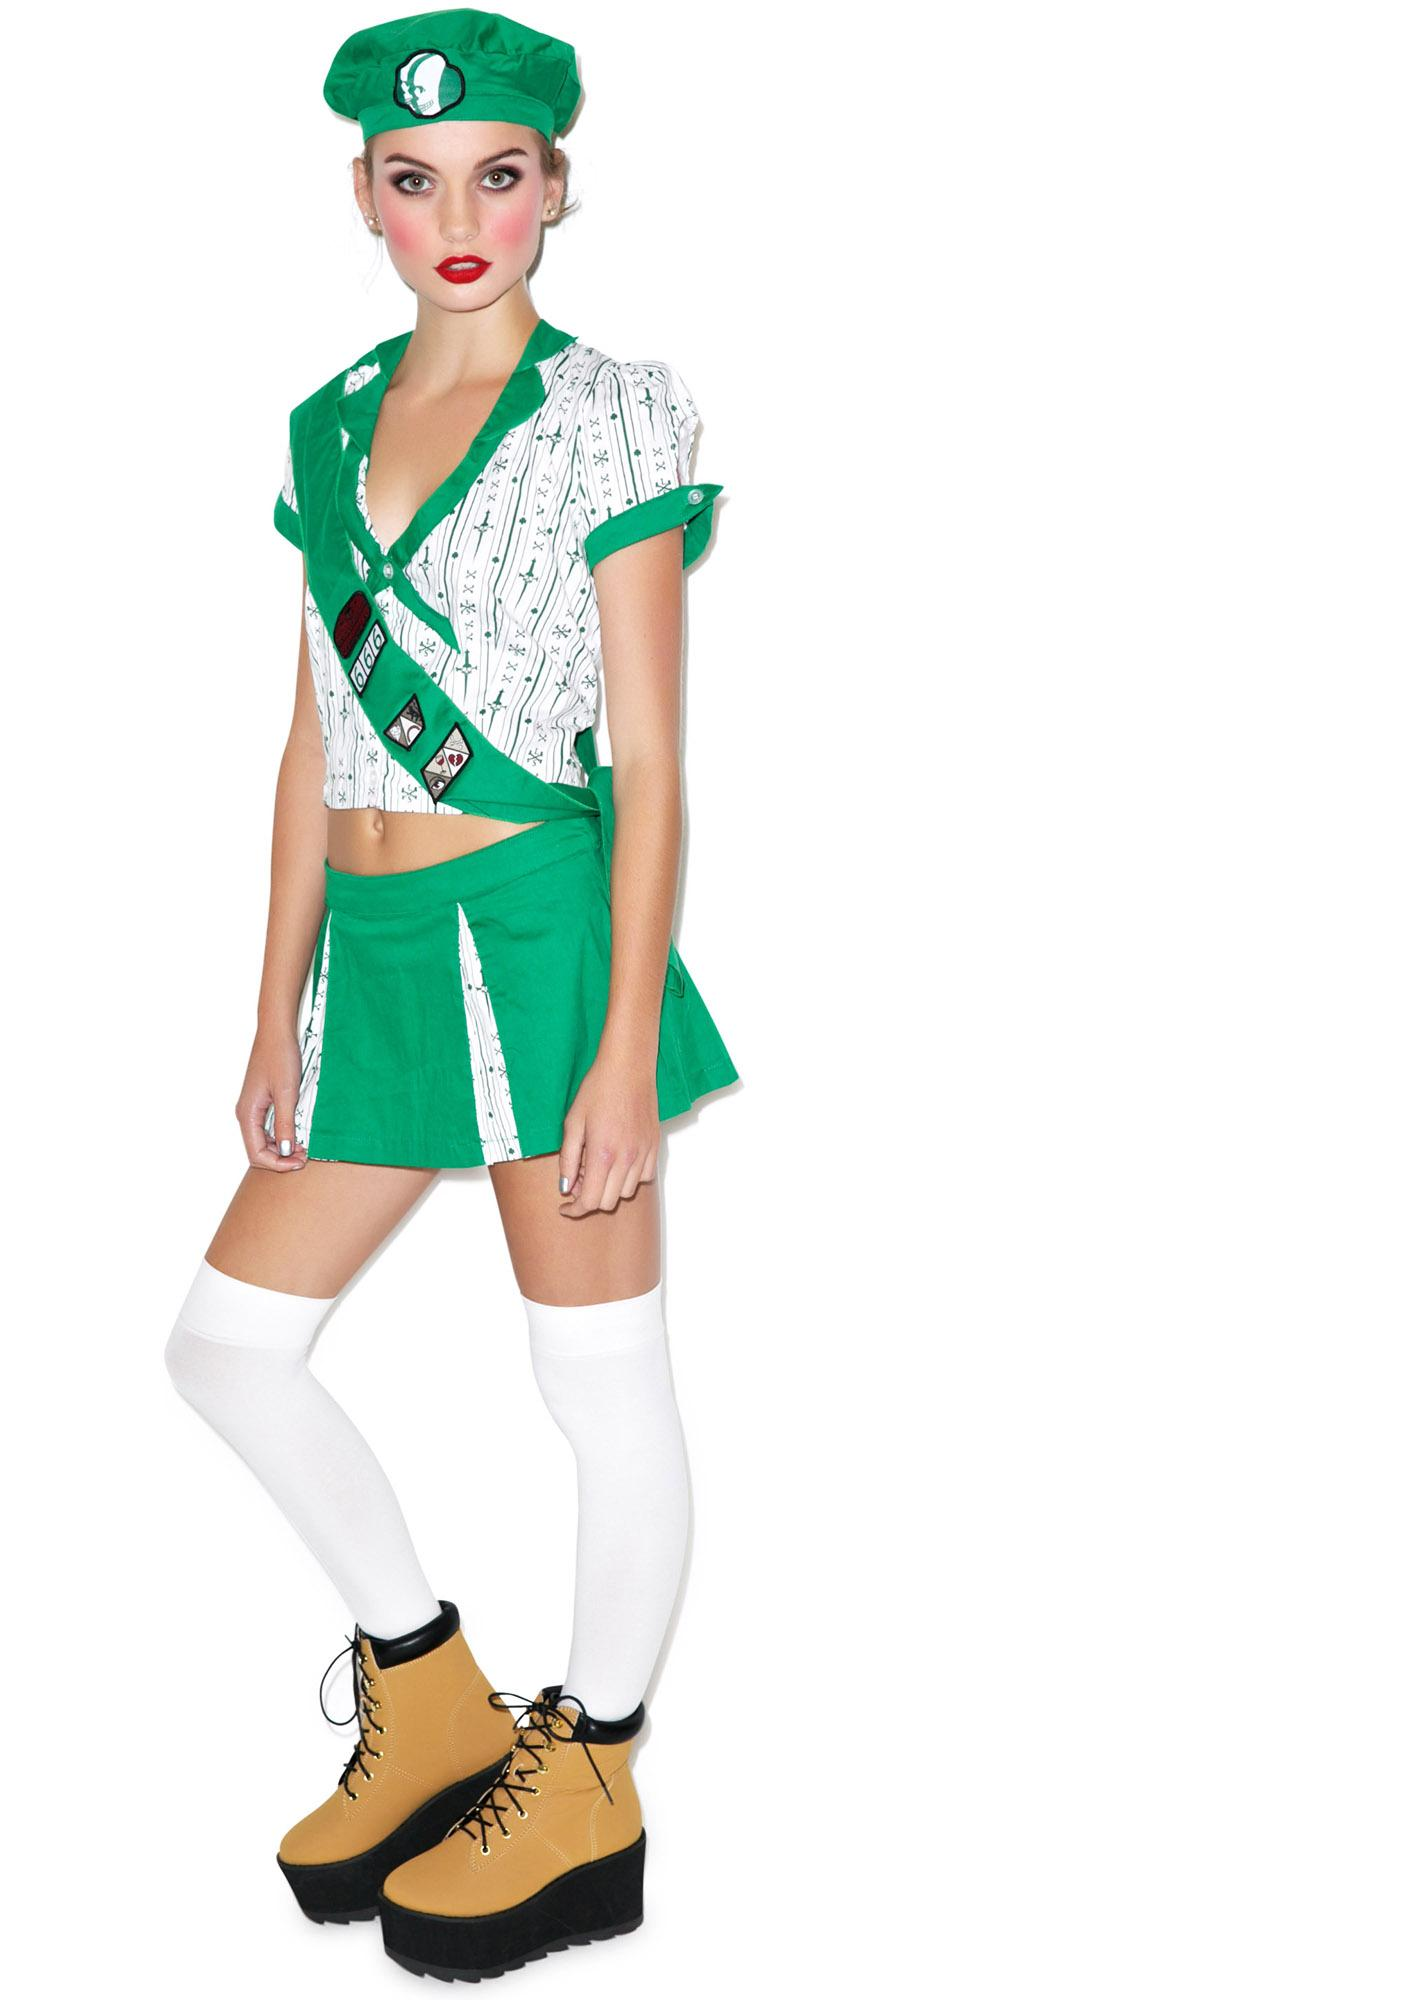 Lip Service G. Scout Costume